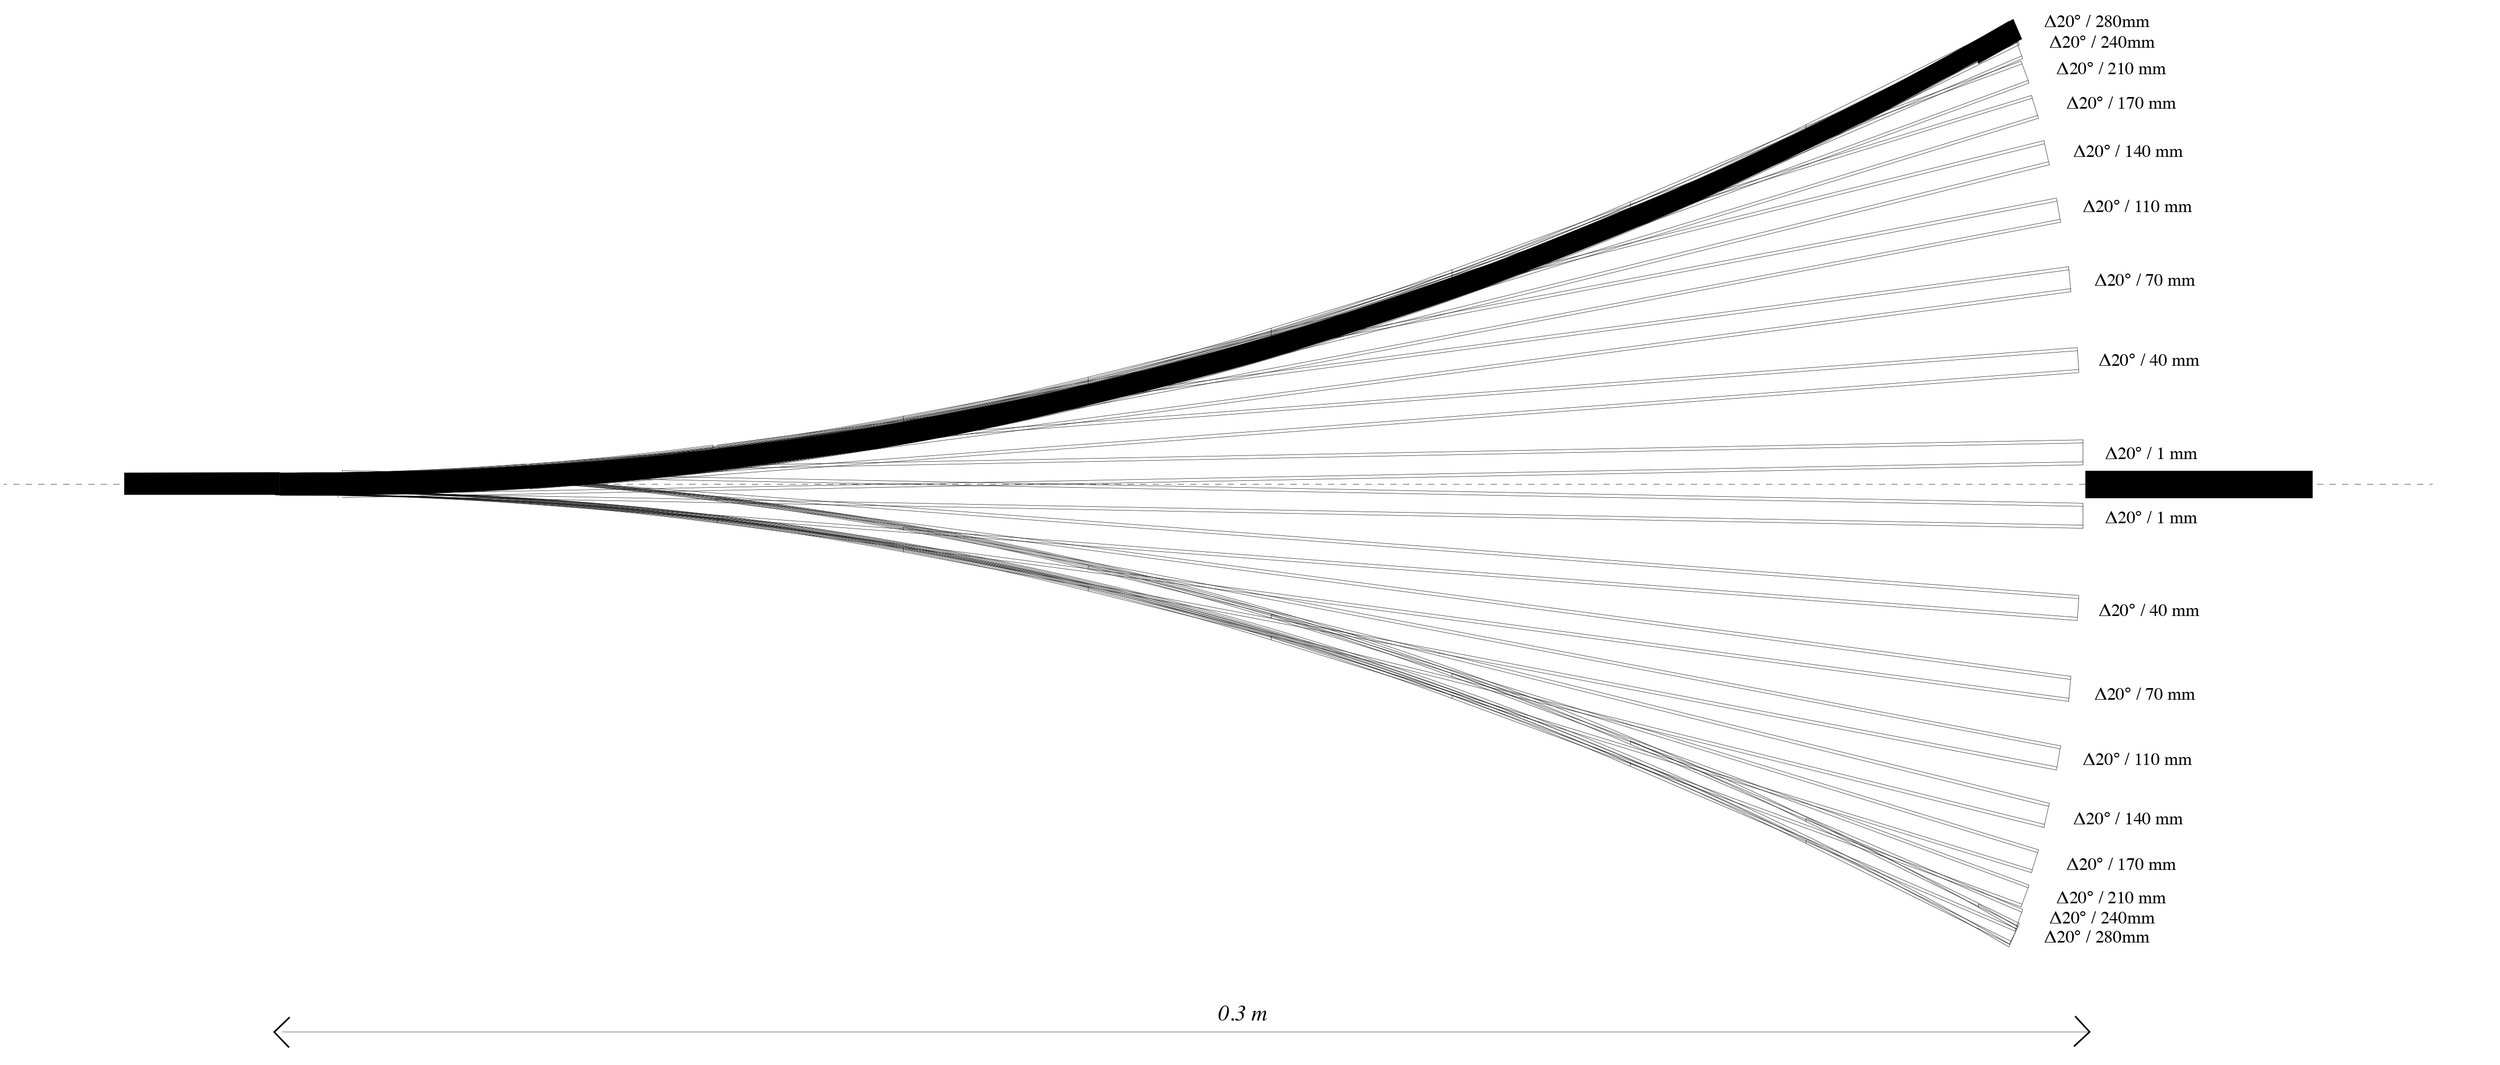 Sense-III-12drawing.jpg